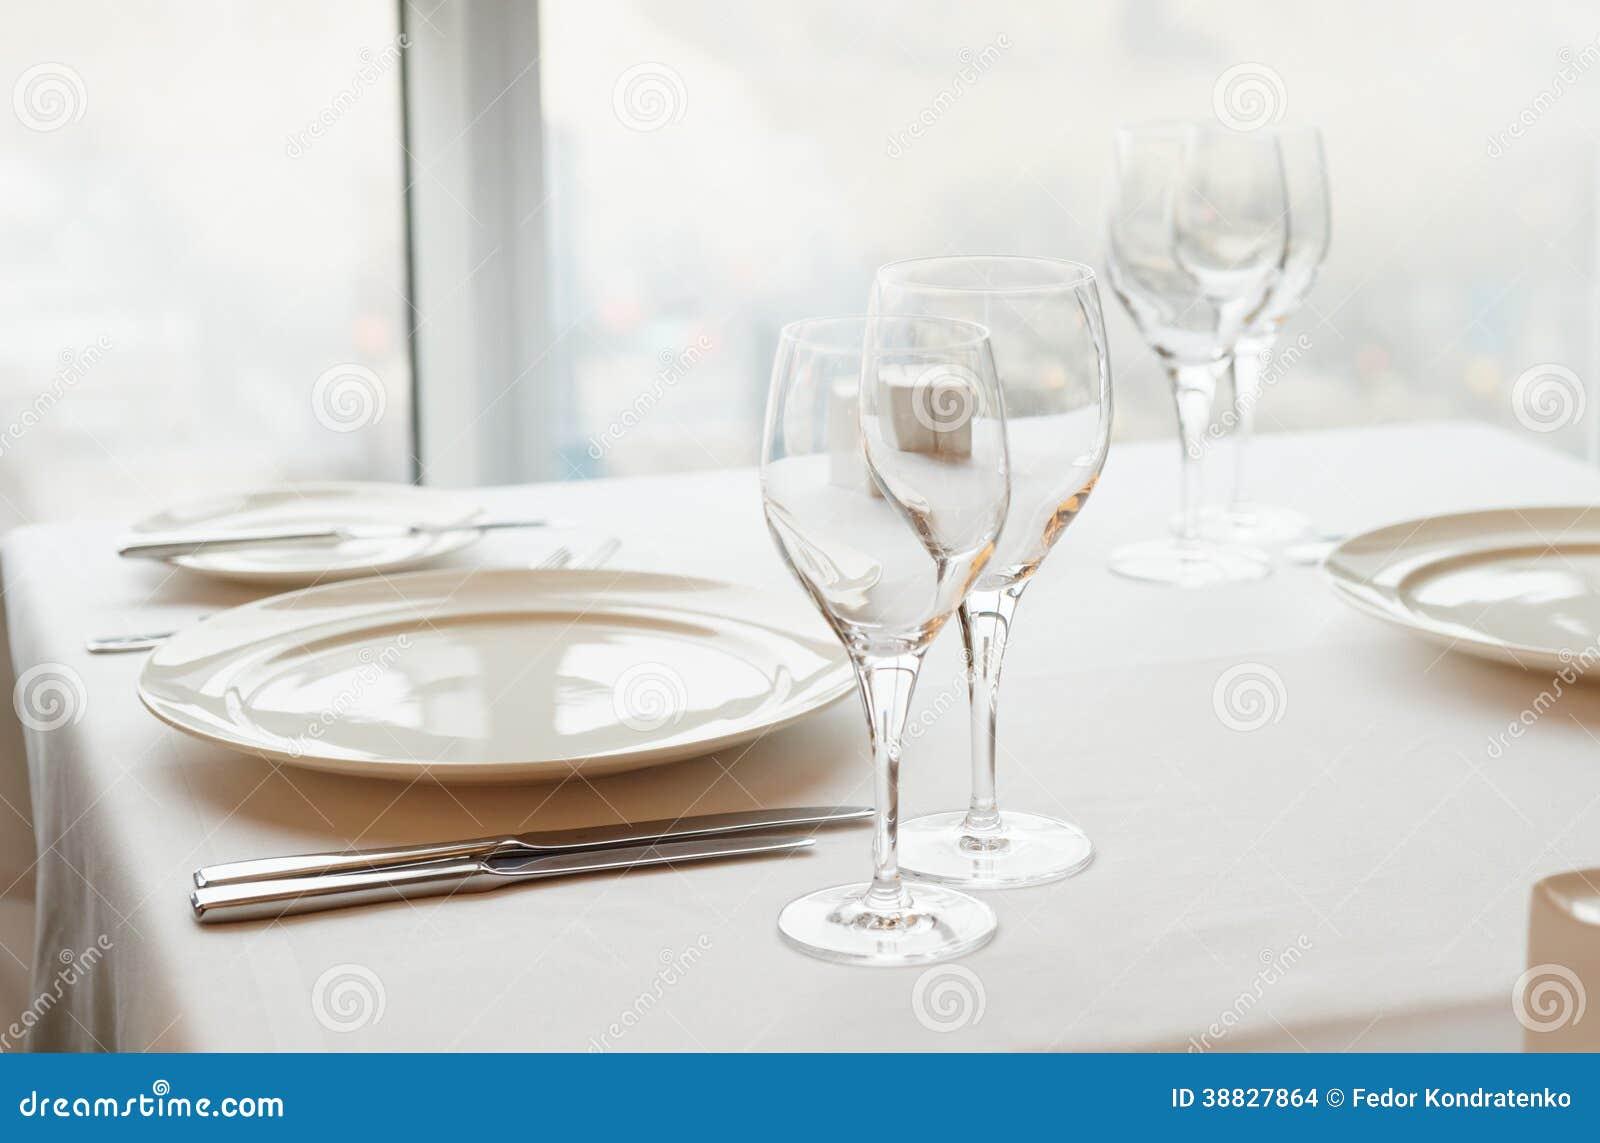 table arrangement in an expensive restaurant stock photo image 38827864. Black Bedroom Furniture Sets. Home Design Ideas